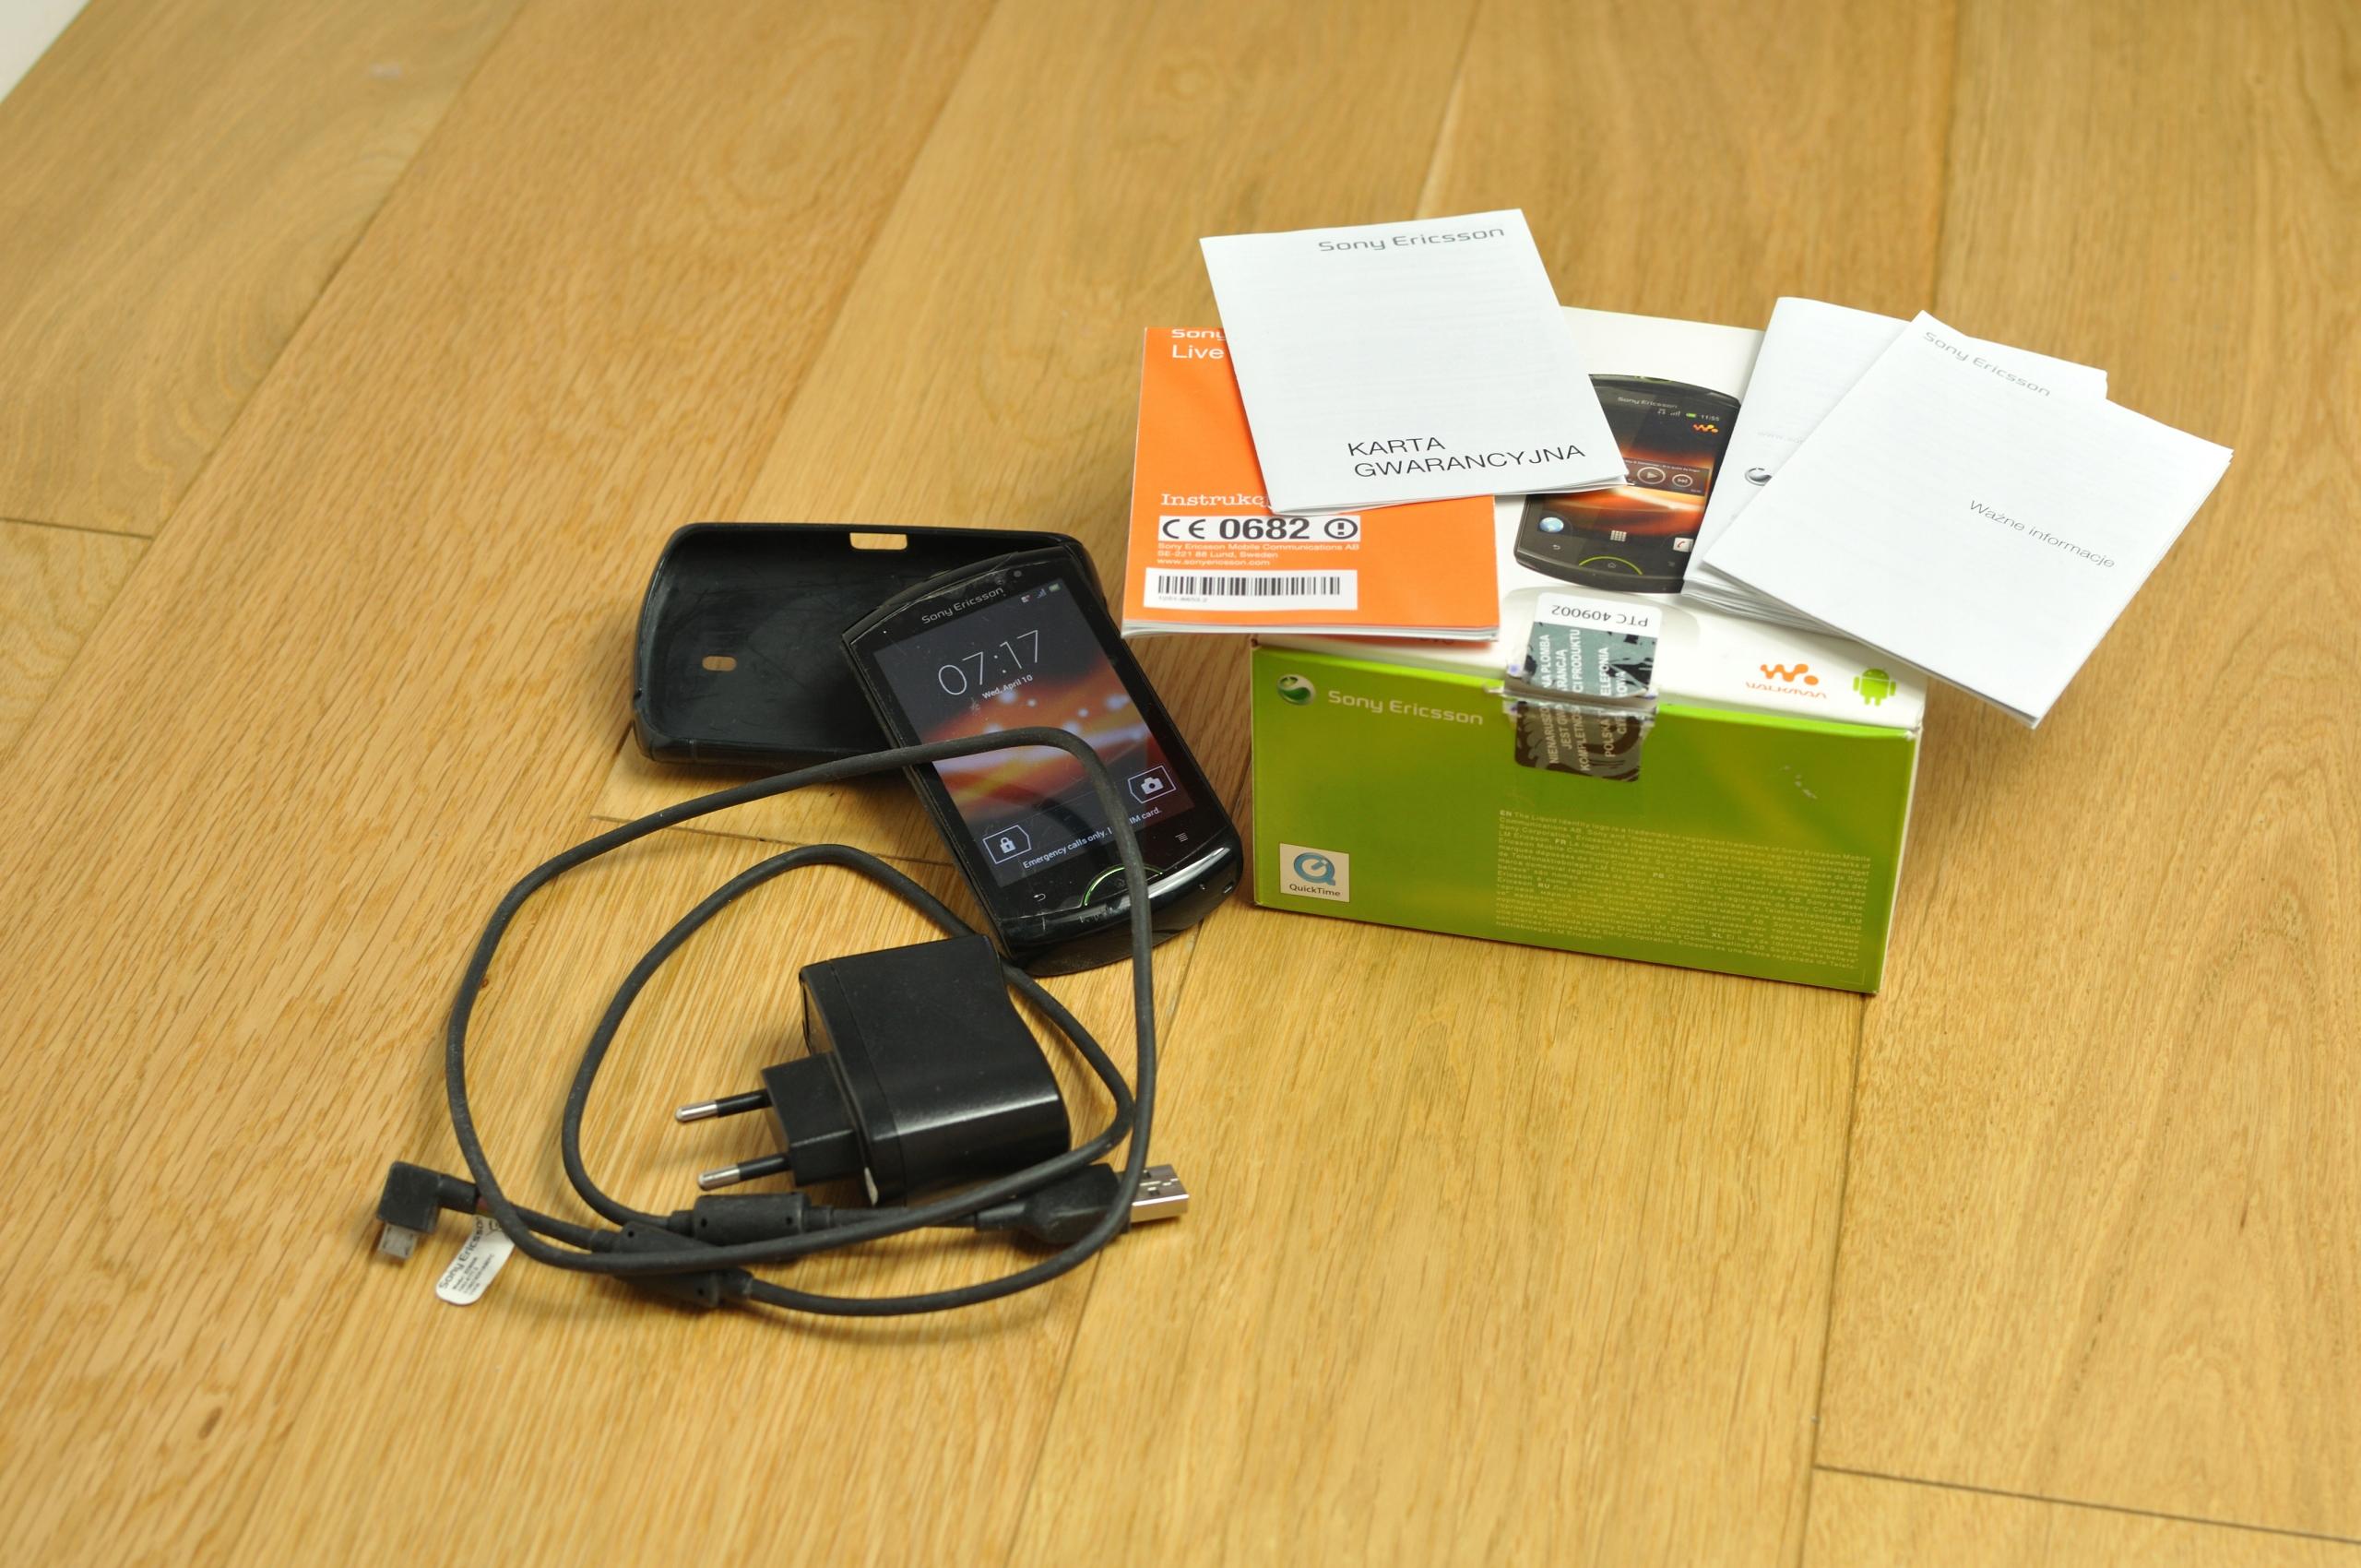 Sony Ericsson Walkman WT19i + GRATIS